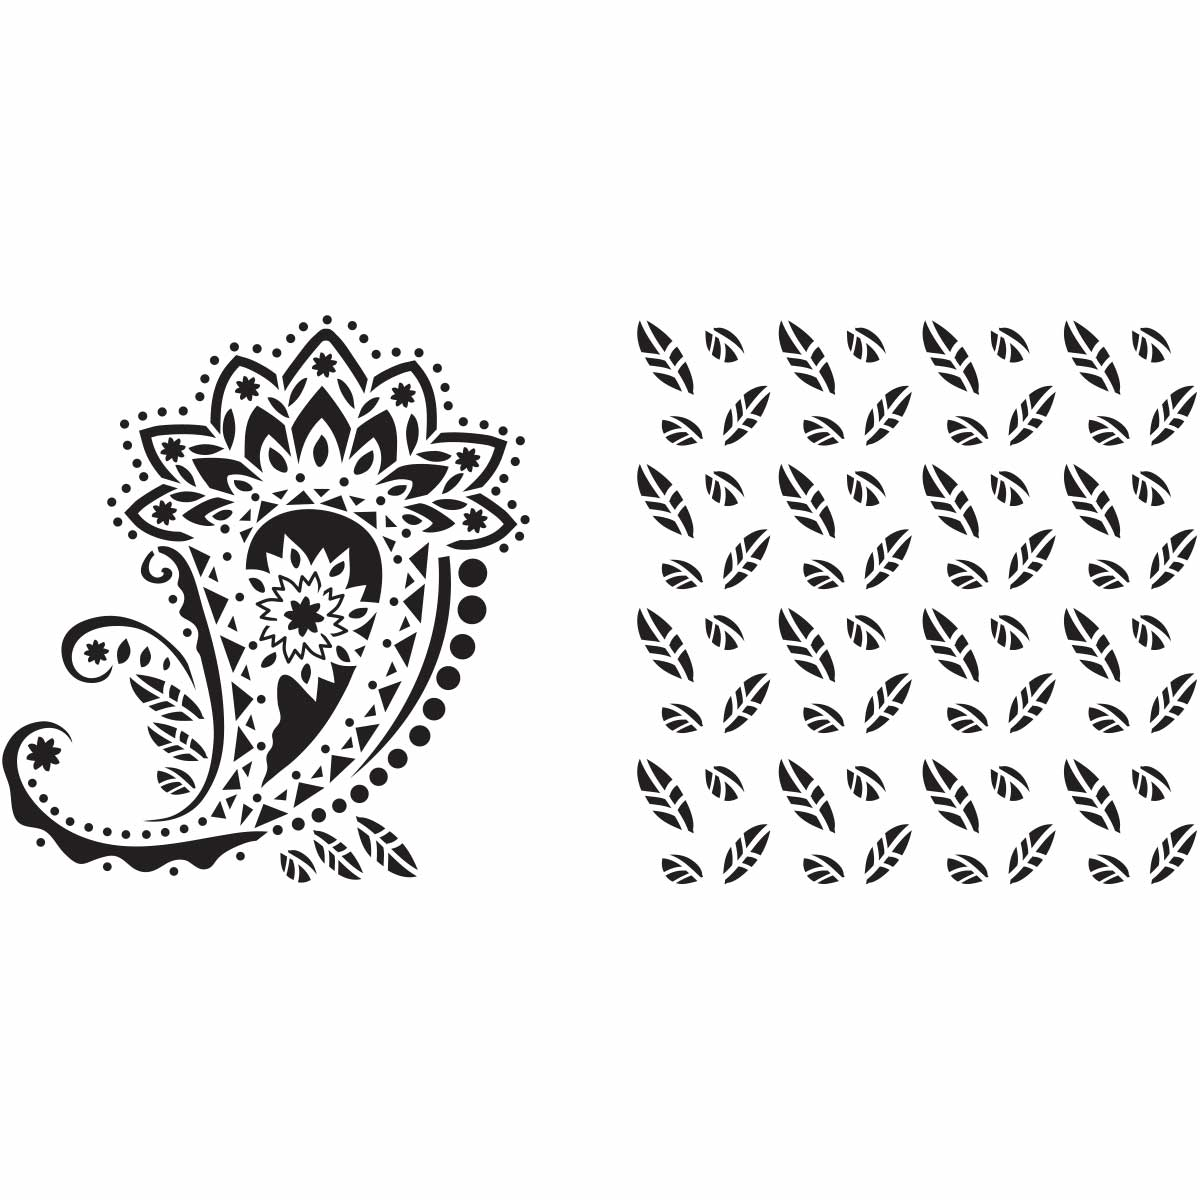 Fabric Creations™ Adhesive Stencils - Paisley, 6